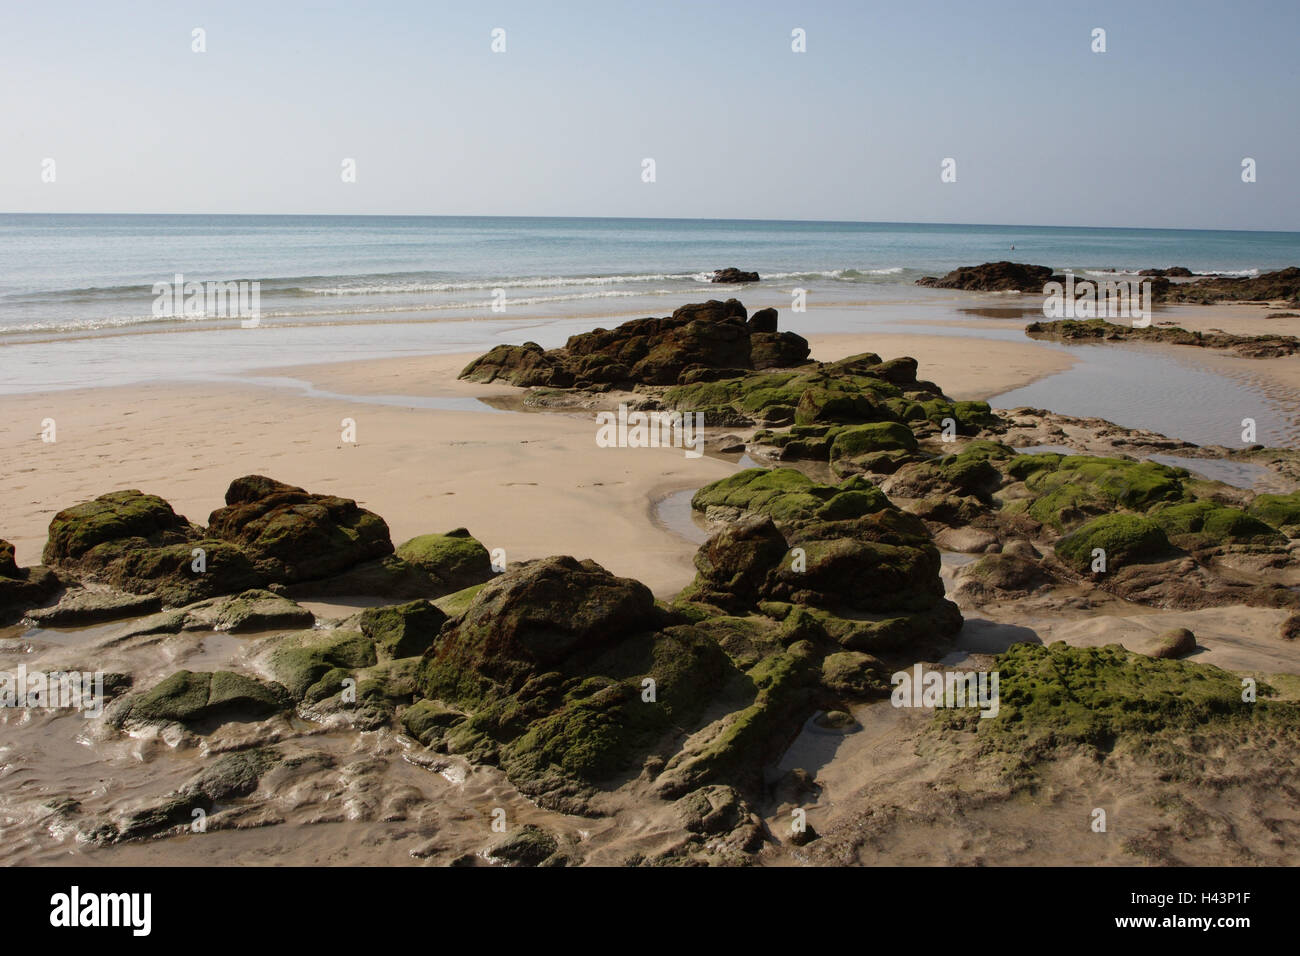 Bile coast, beach, on Fuerteventura to Costa Calma, - Stock Image